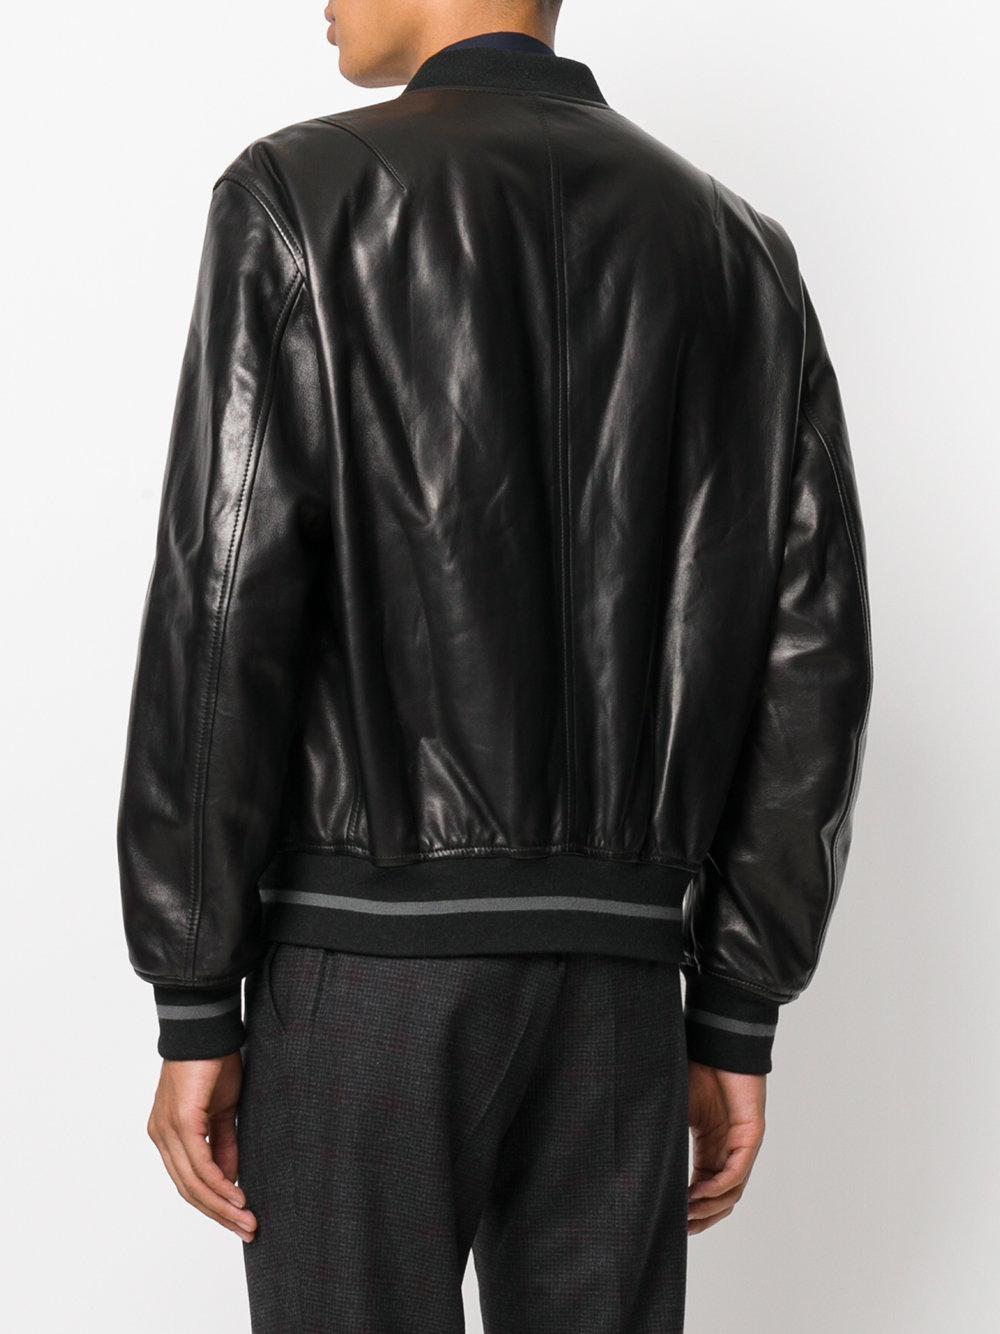 c07c335f1 Ferragamo Bomber Jacket in Black for Men - Lyst